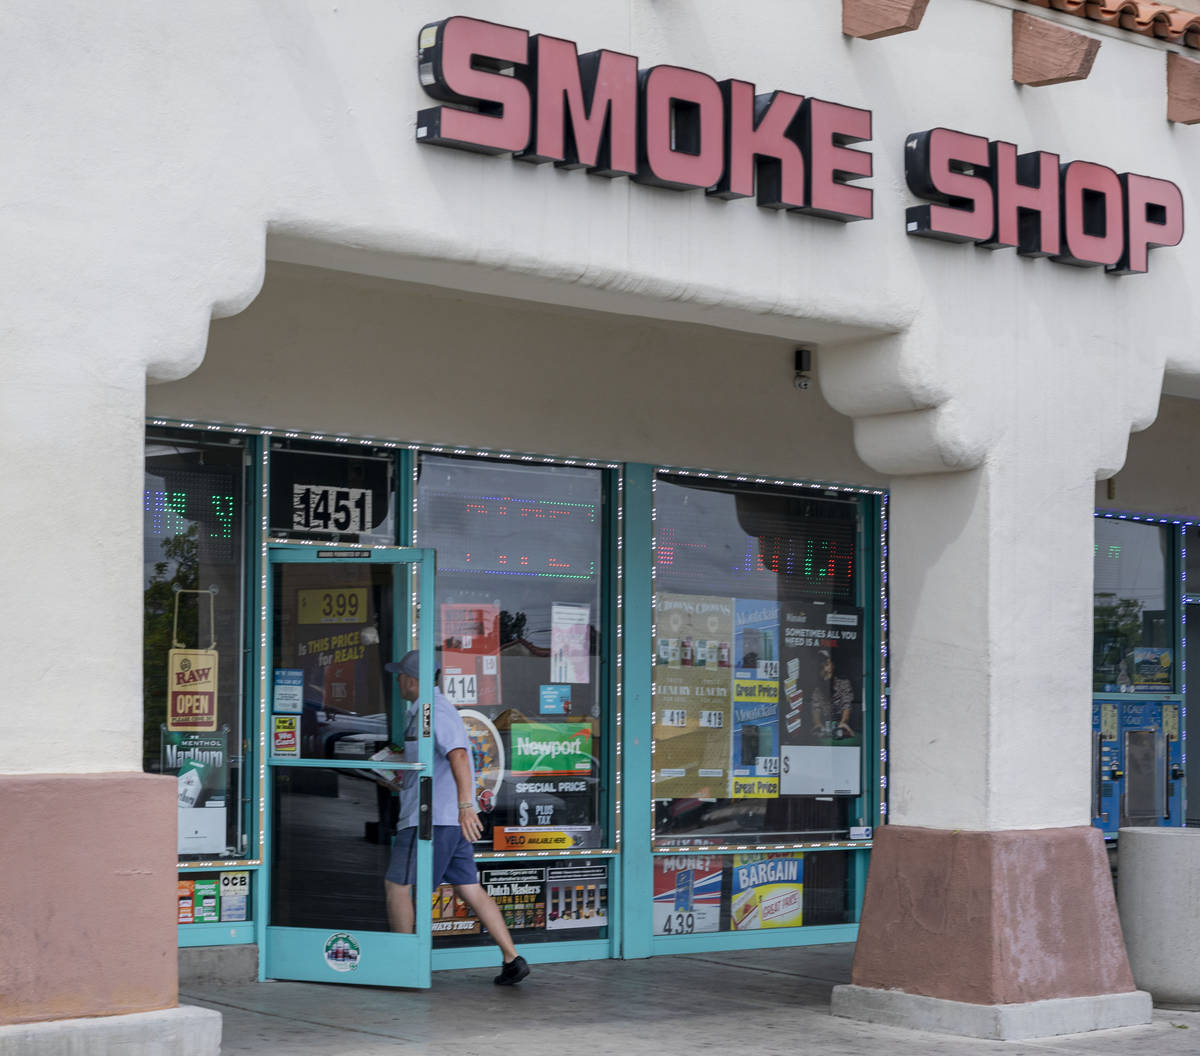 Jit 4 Cigarettes Cheap, a smoke shop, at 1451 North Jones Boulevard in Las Vegas remains open d ...